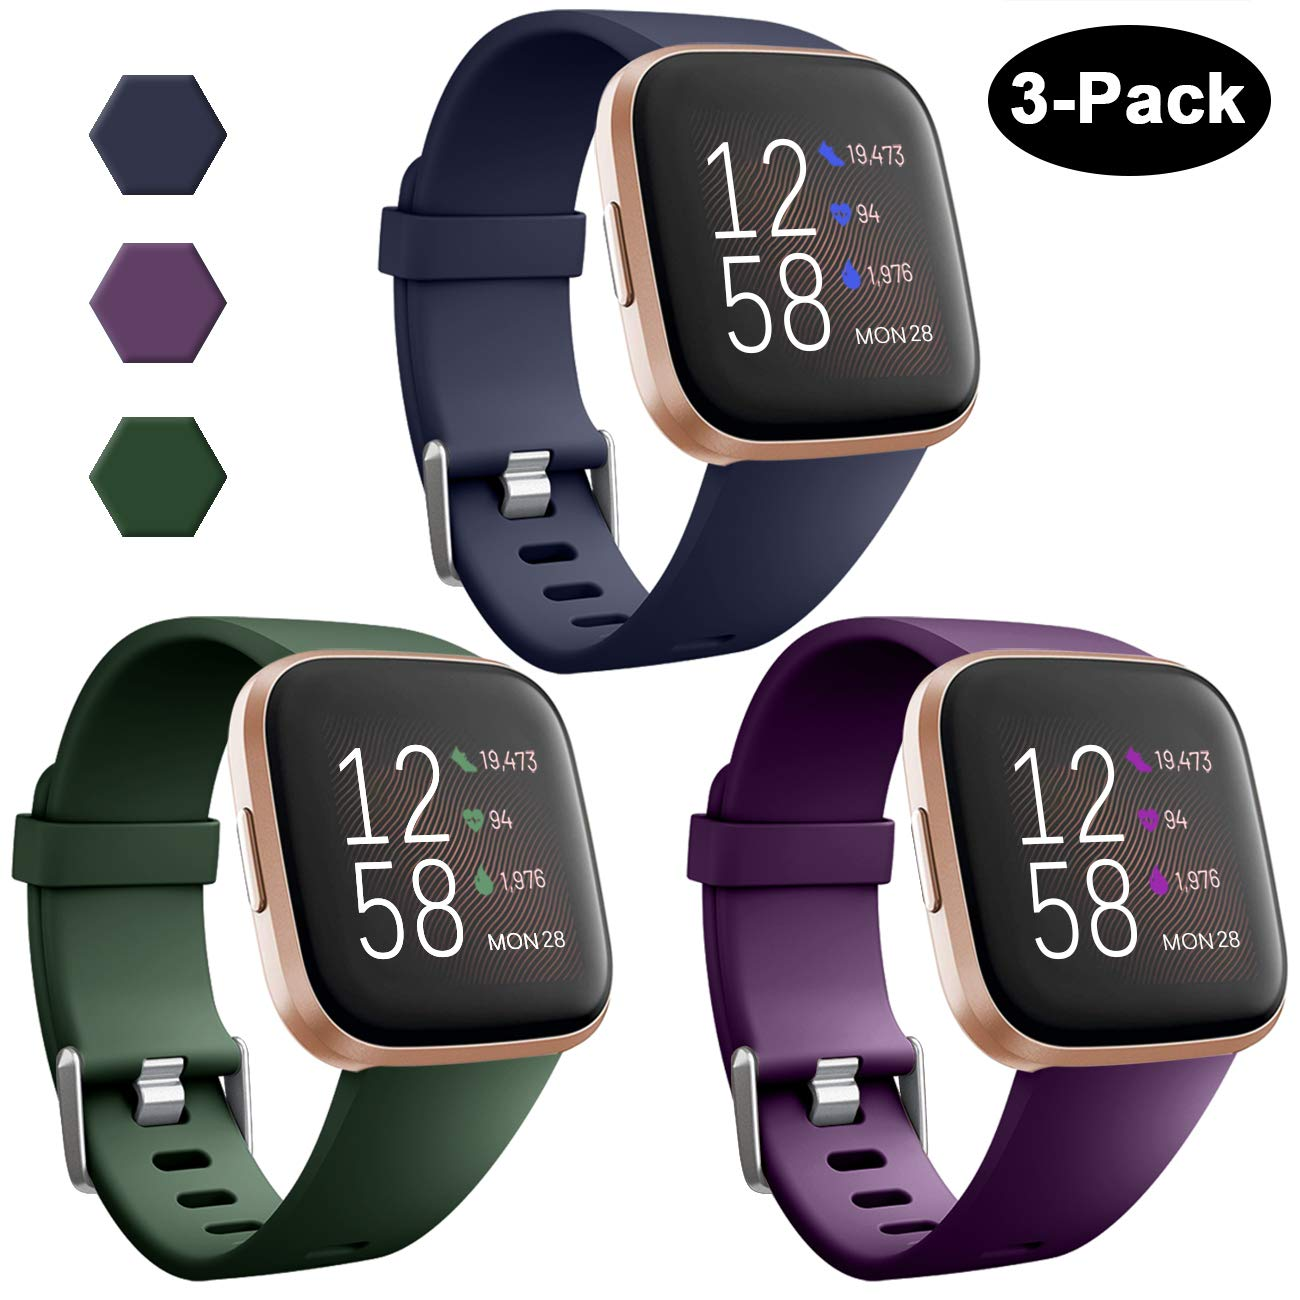 Mallas Reloj Fitbit Versa/fitbit Versa Lite (3 Unid) Talle L